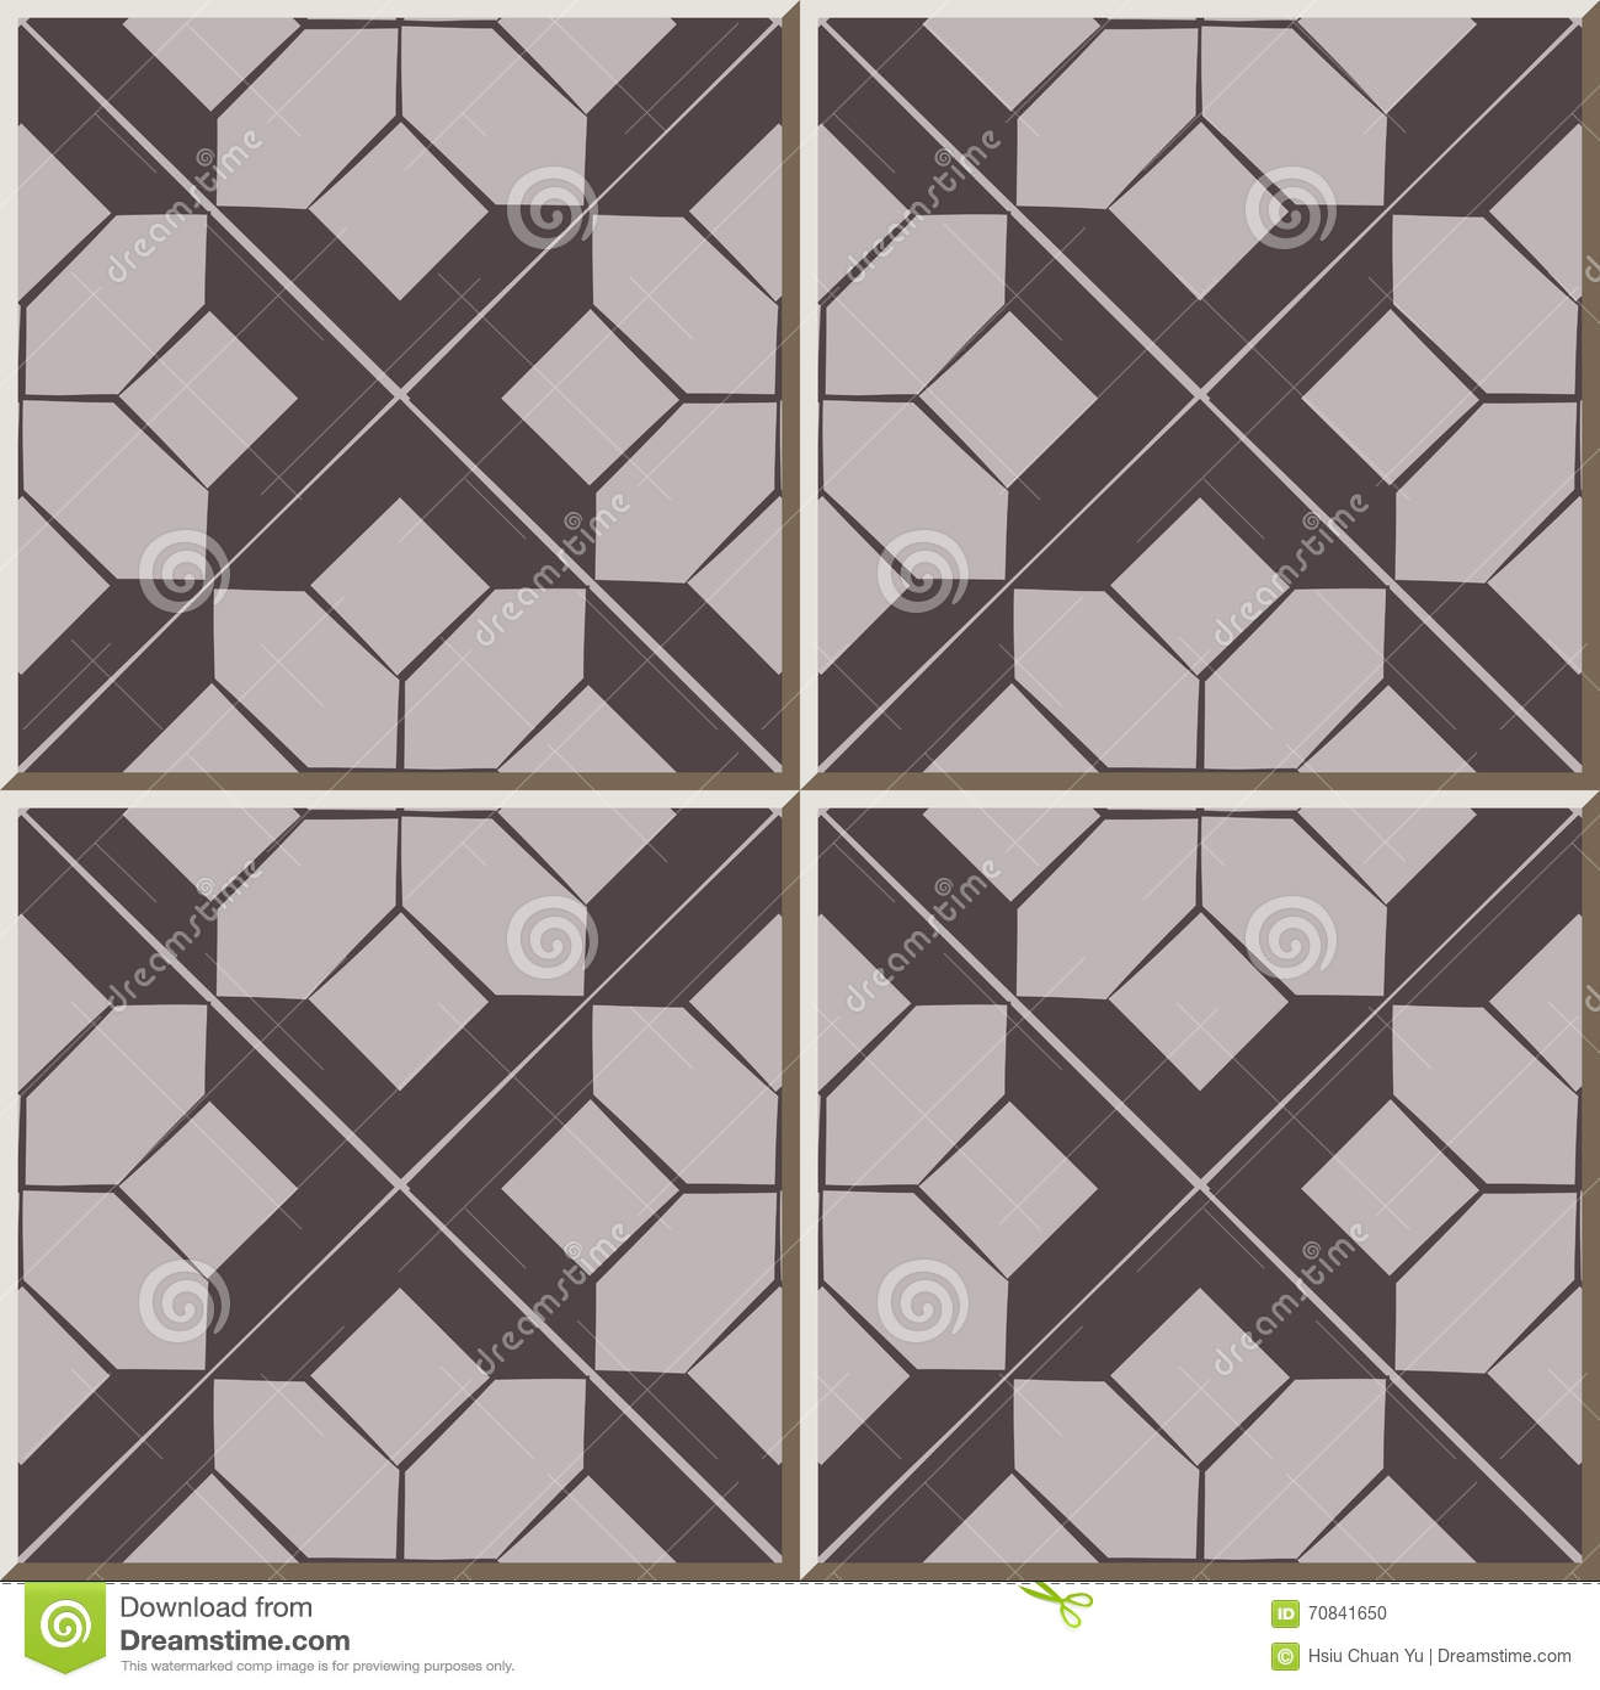 Ceramic tile pattern 308 brown check cross geometry